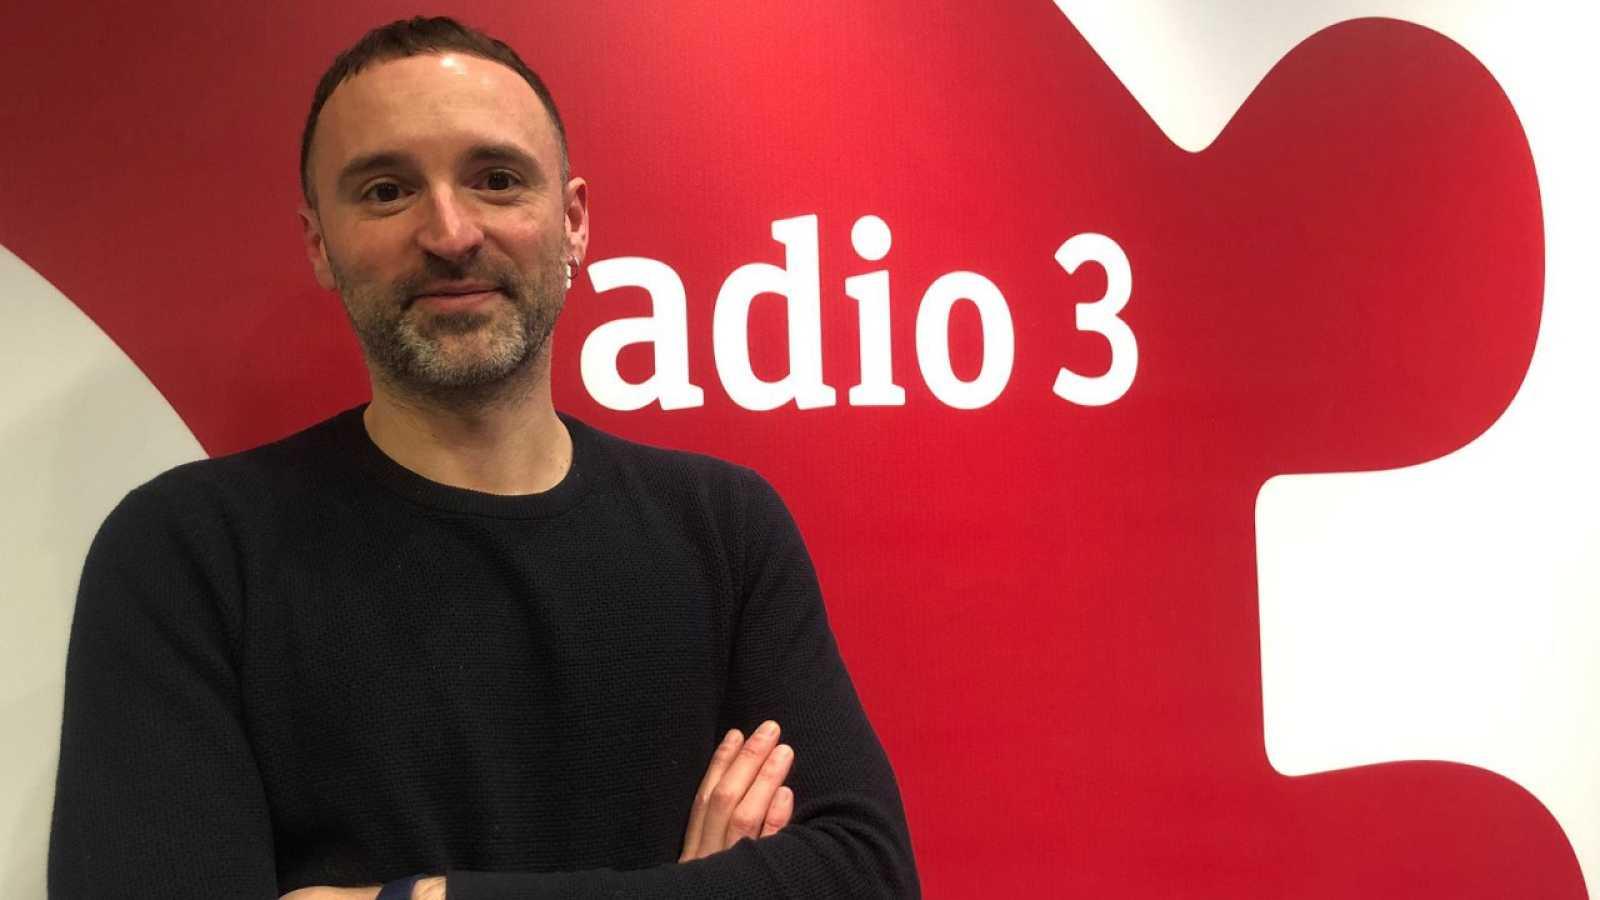 En Radio 3 - Sebas E. Alonso, Jenesaispop - 06/02/21 - escuchar ahora